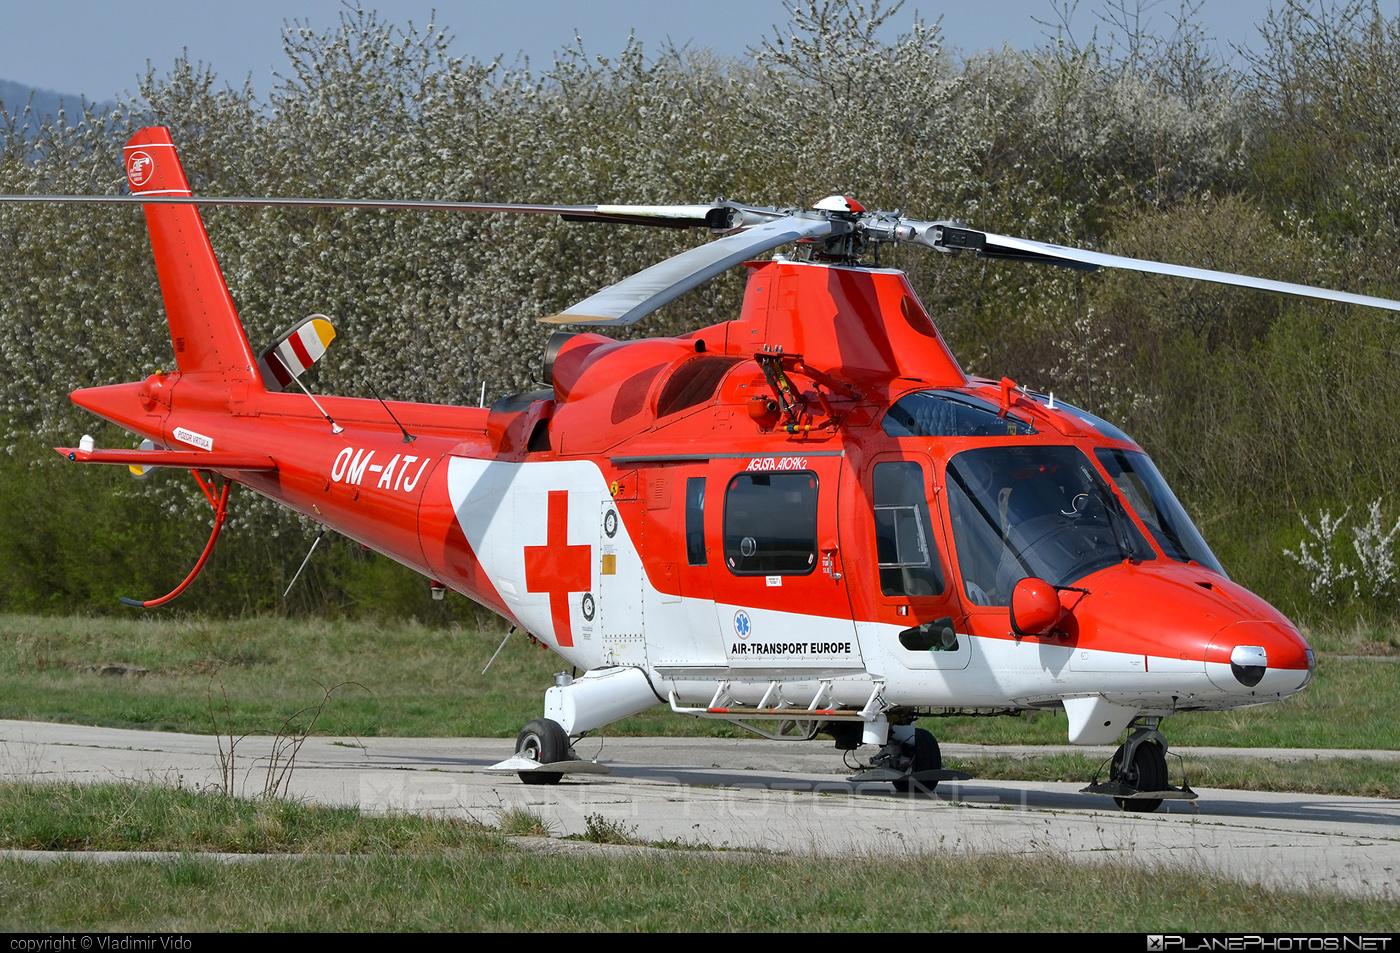 Air Transport Europe Agusta A109K2 - OM-ATJ #a109 #a109k2 #agusta #agusta109 #agustaa109 #agustaa109k2 #airtransporteurope